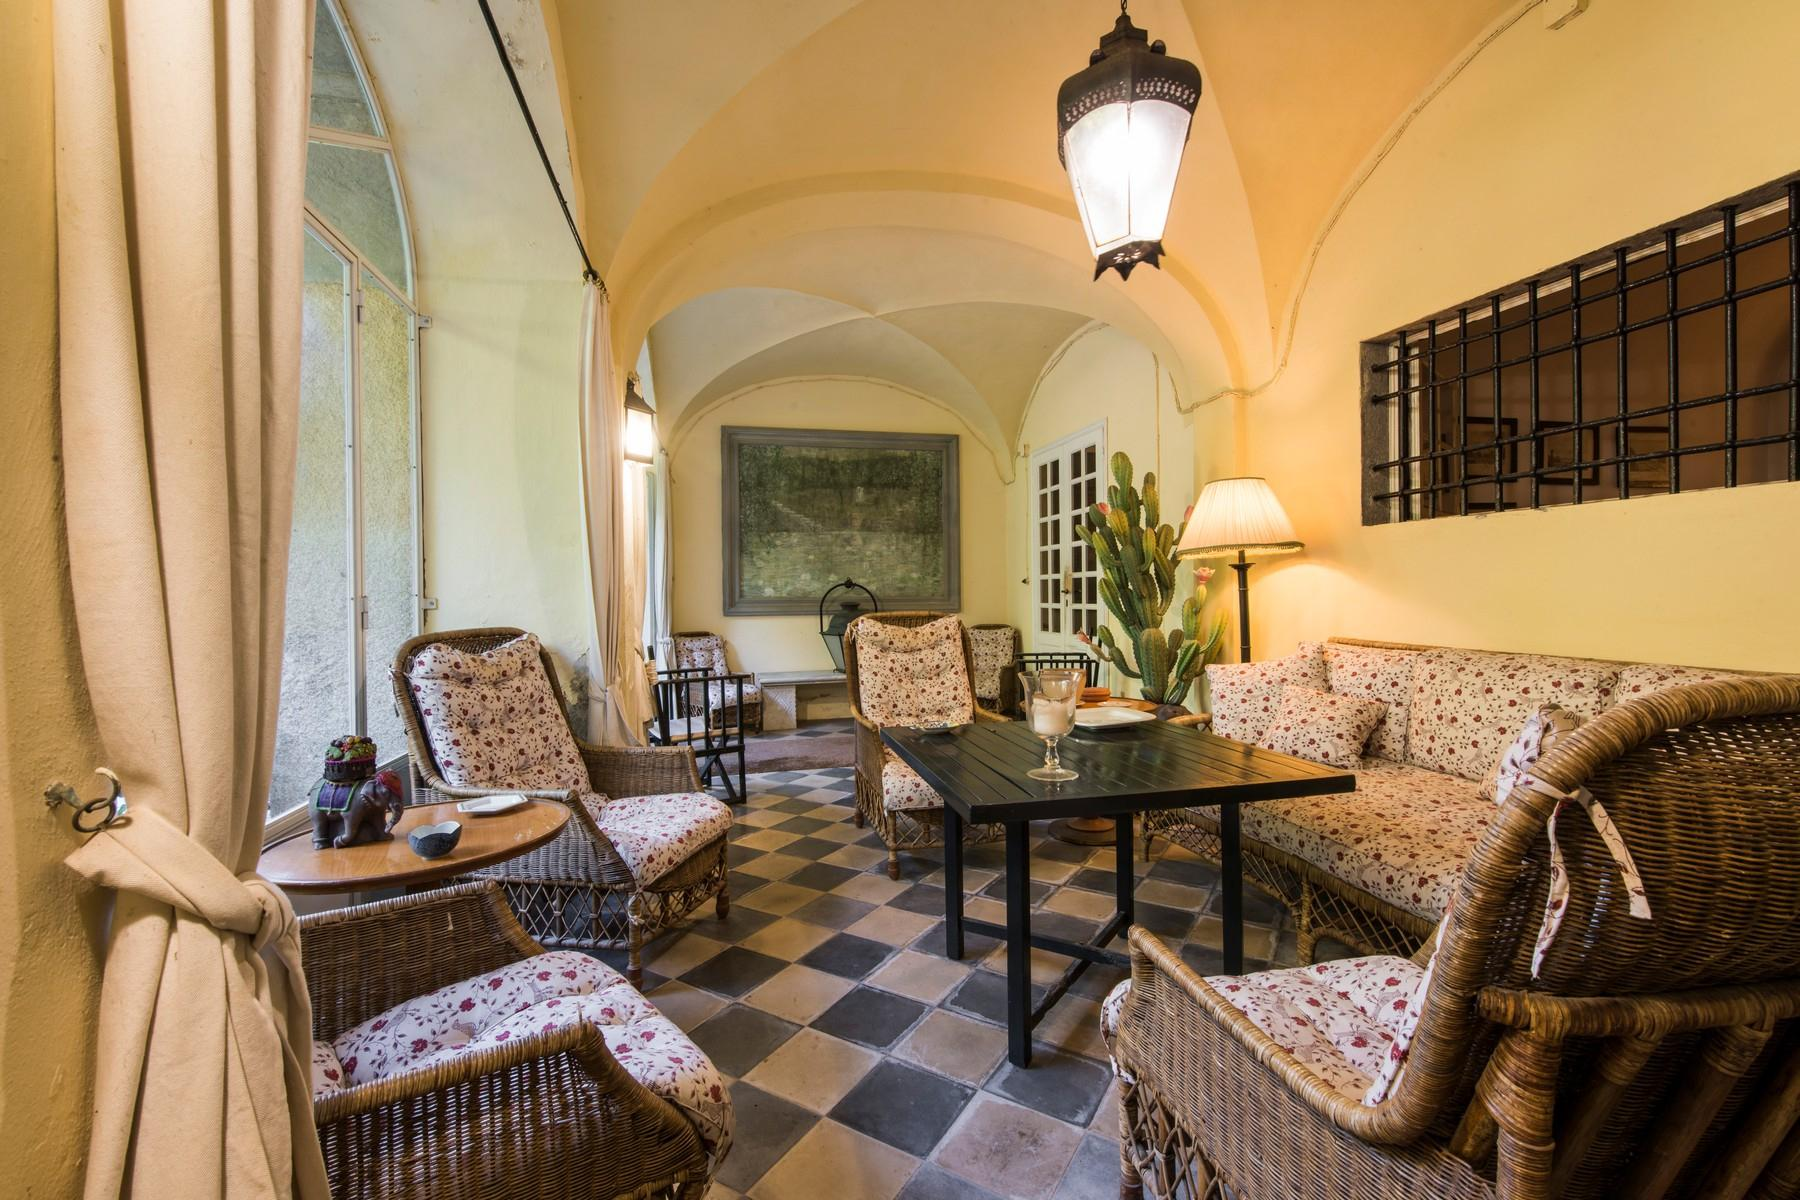 Villa historique en bord de mer à Forte dei Marmi - 25